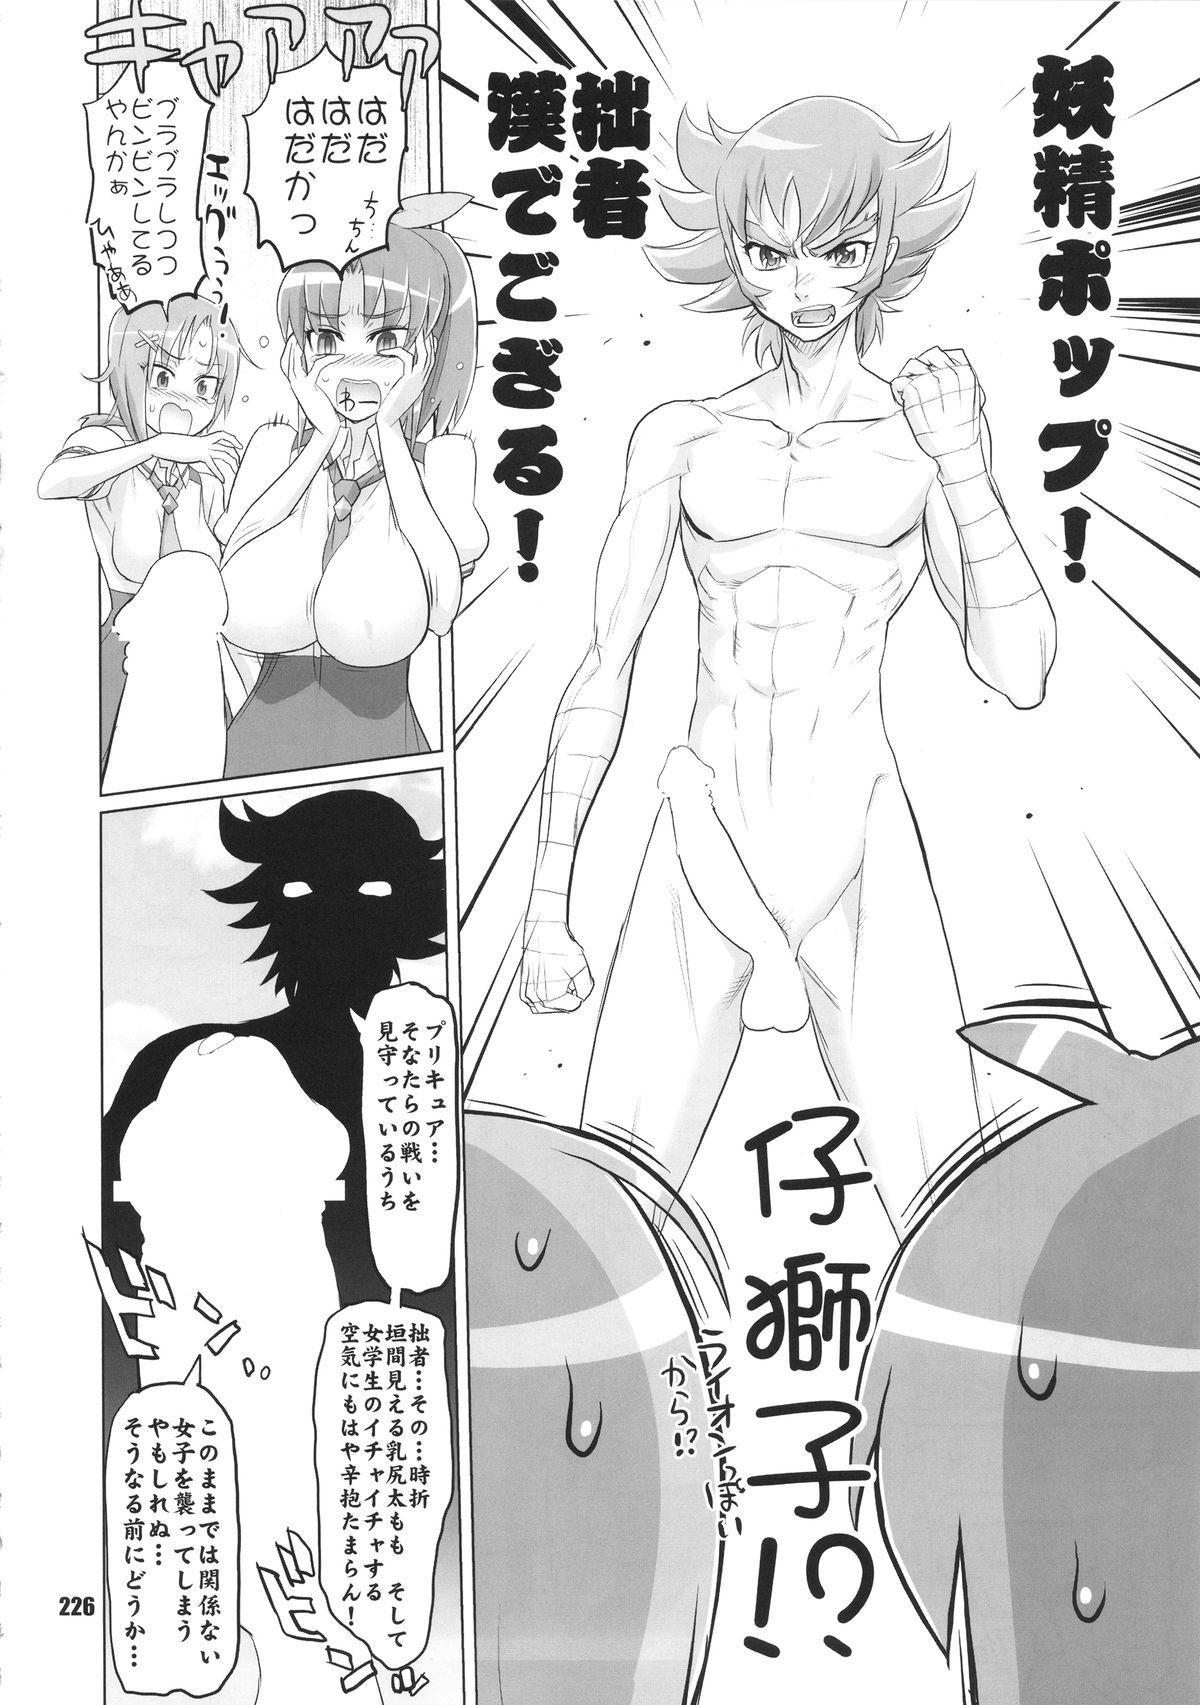 Inazuma Pretty Warrior 224